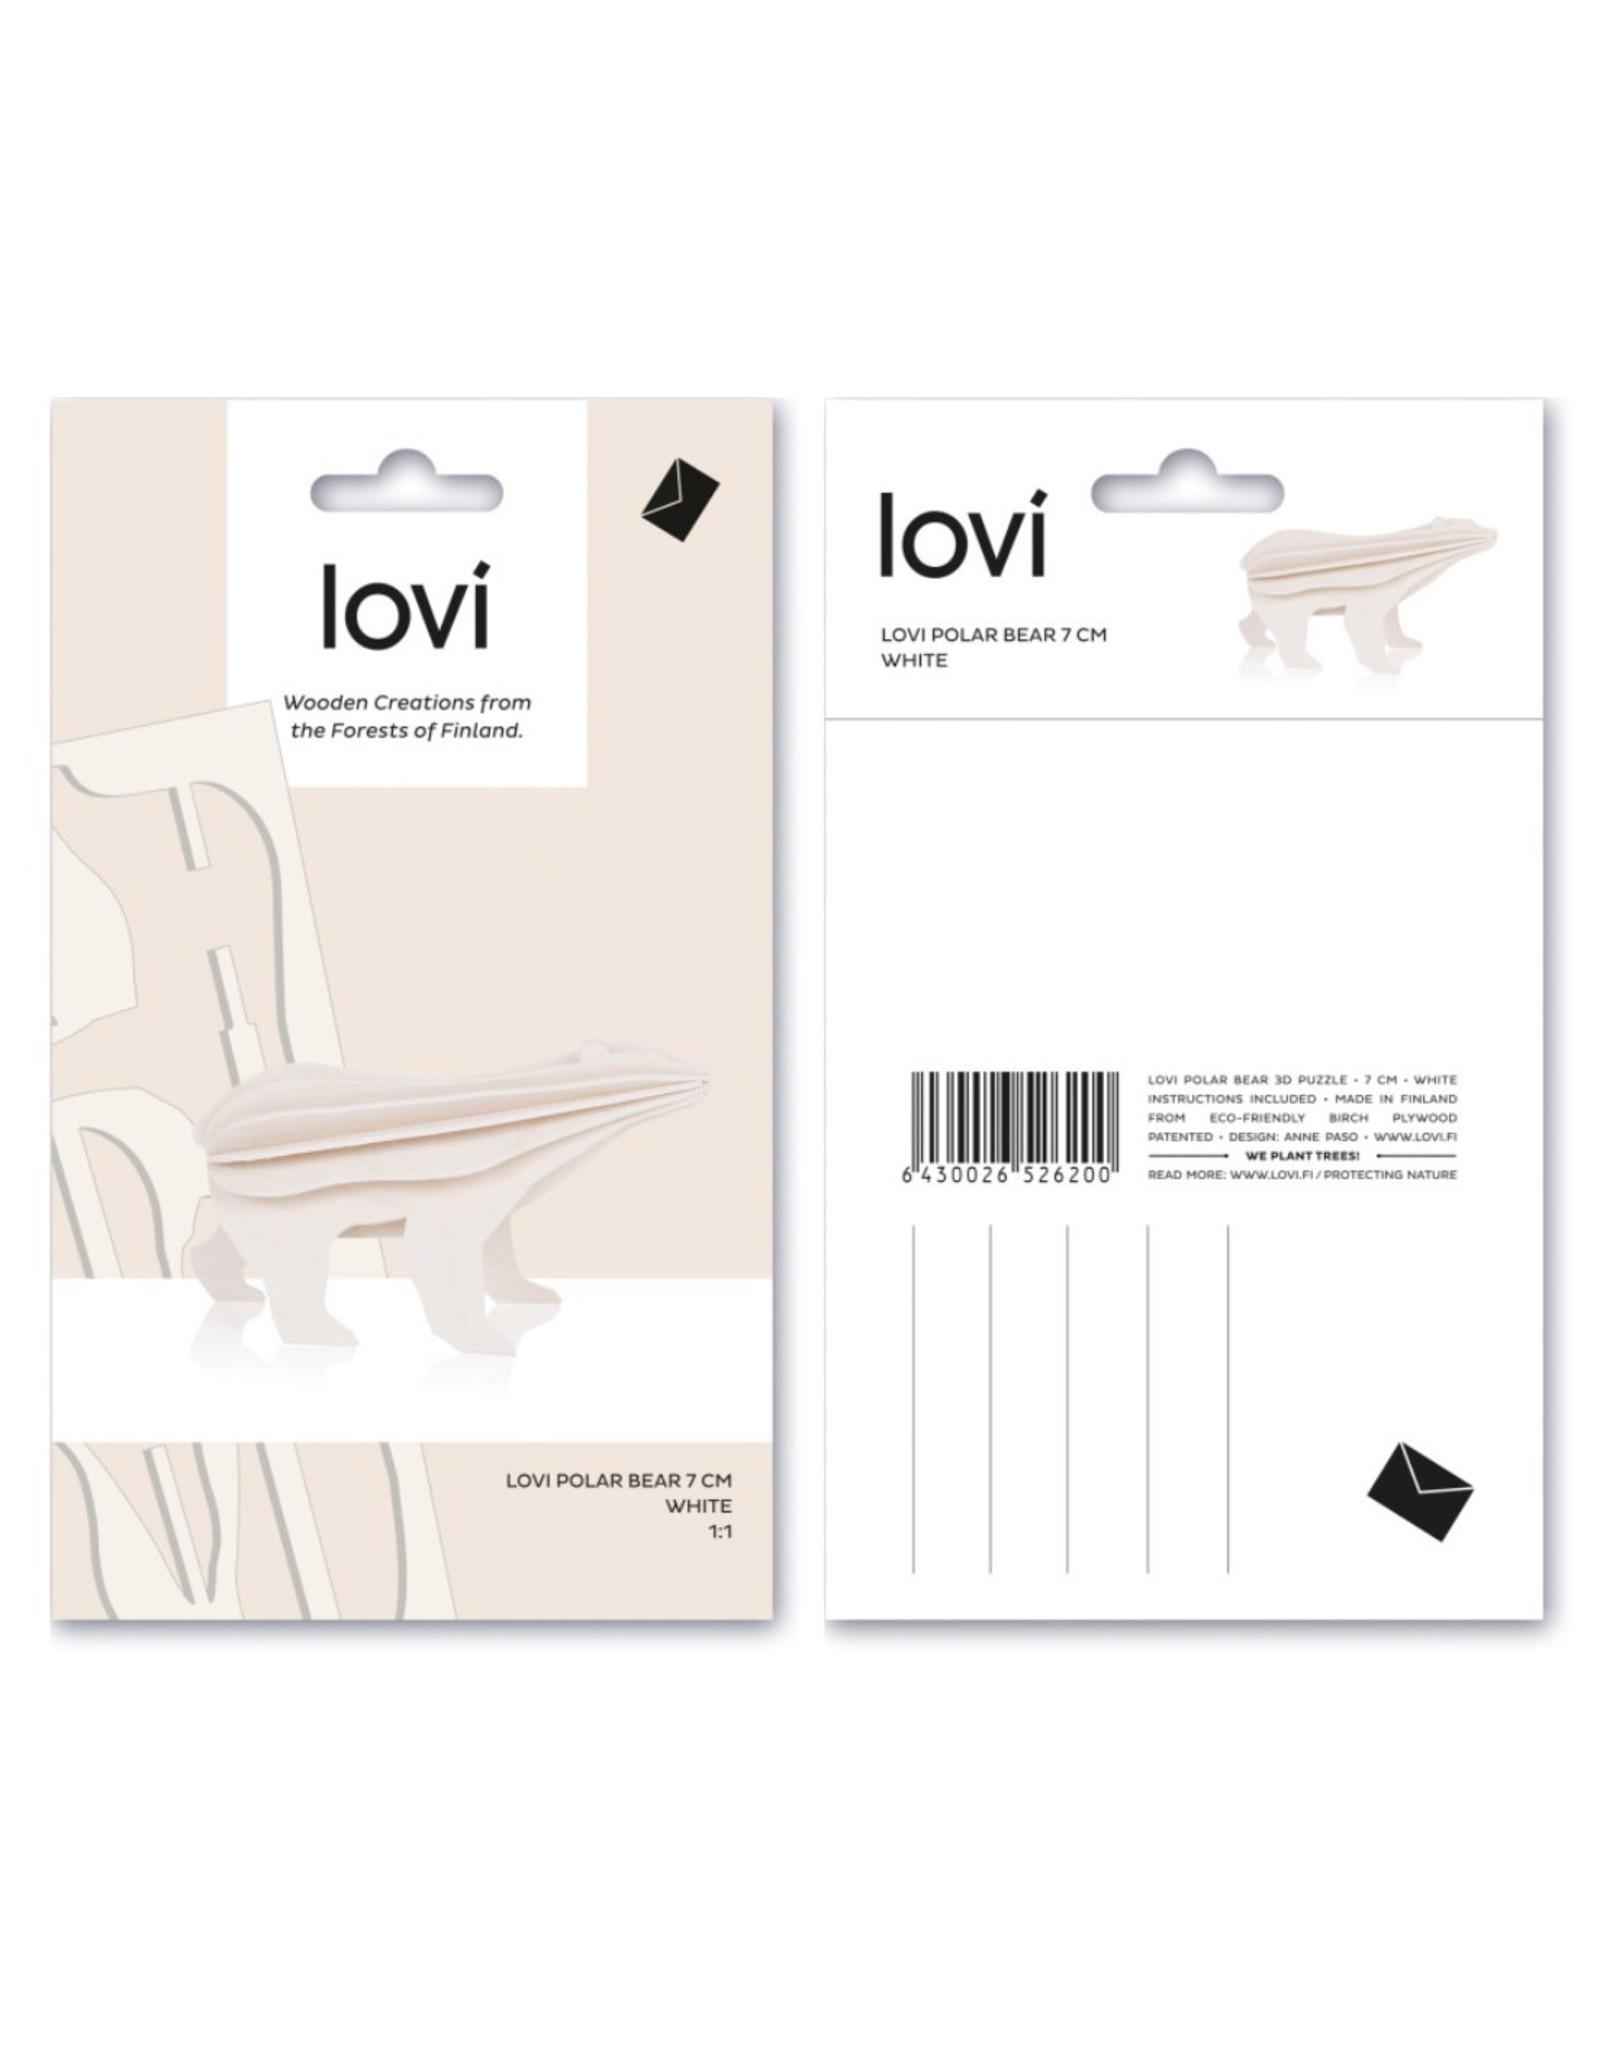 Lovi Wenskaart - Kerst- Ijsbeer 3D - 28 x 17,5